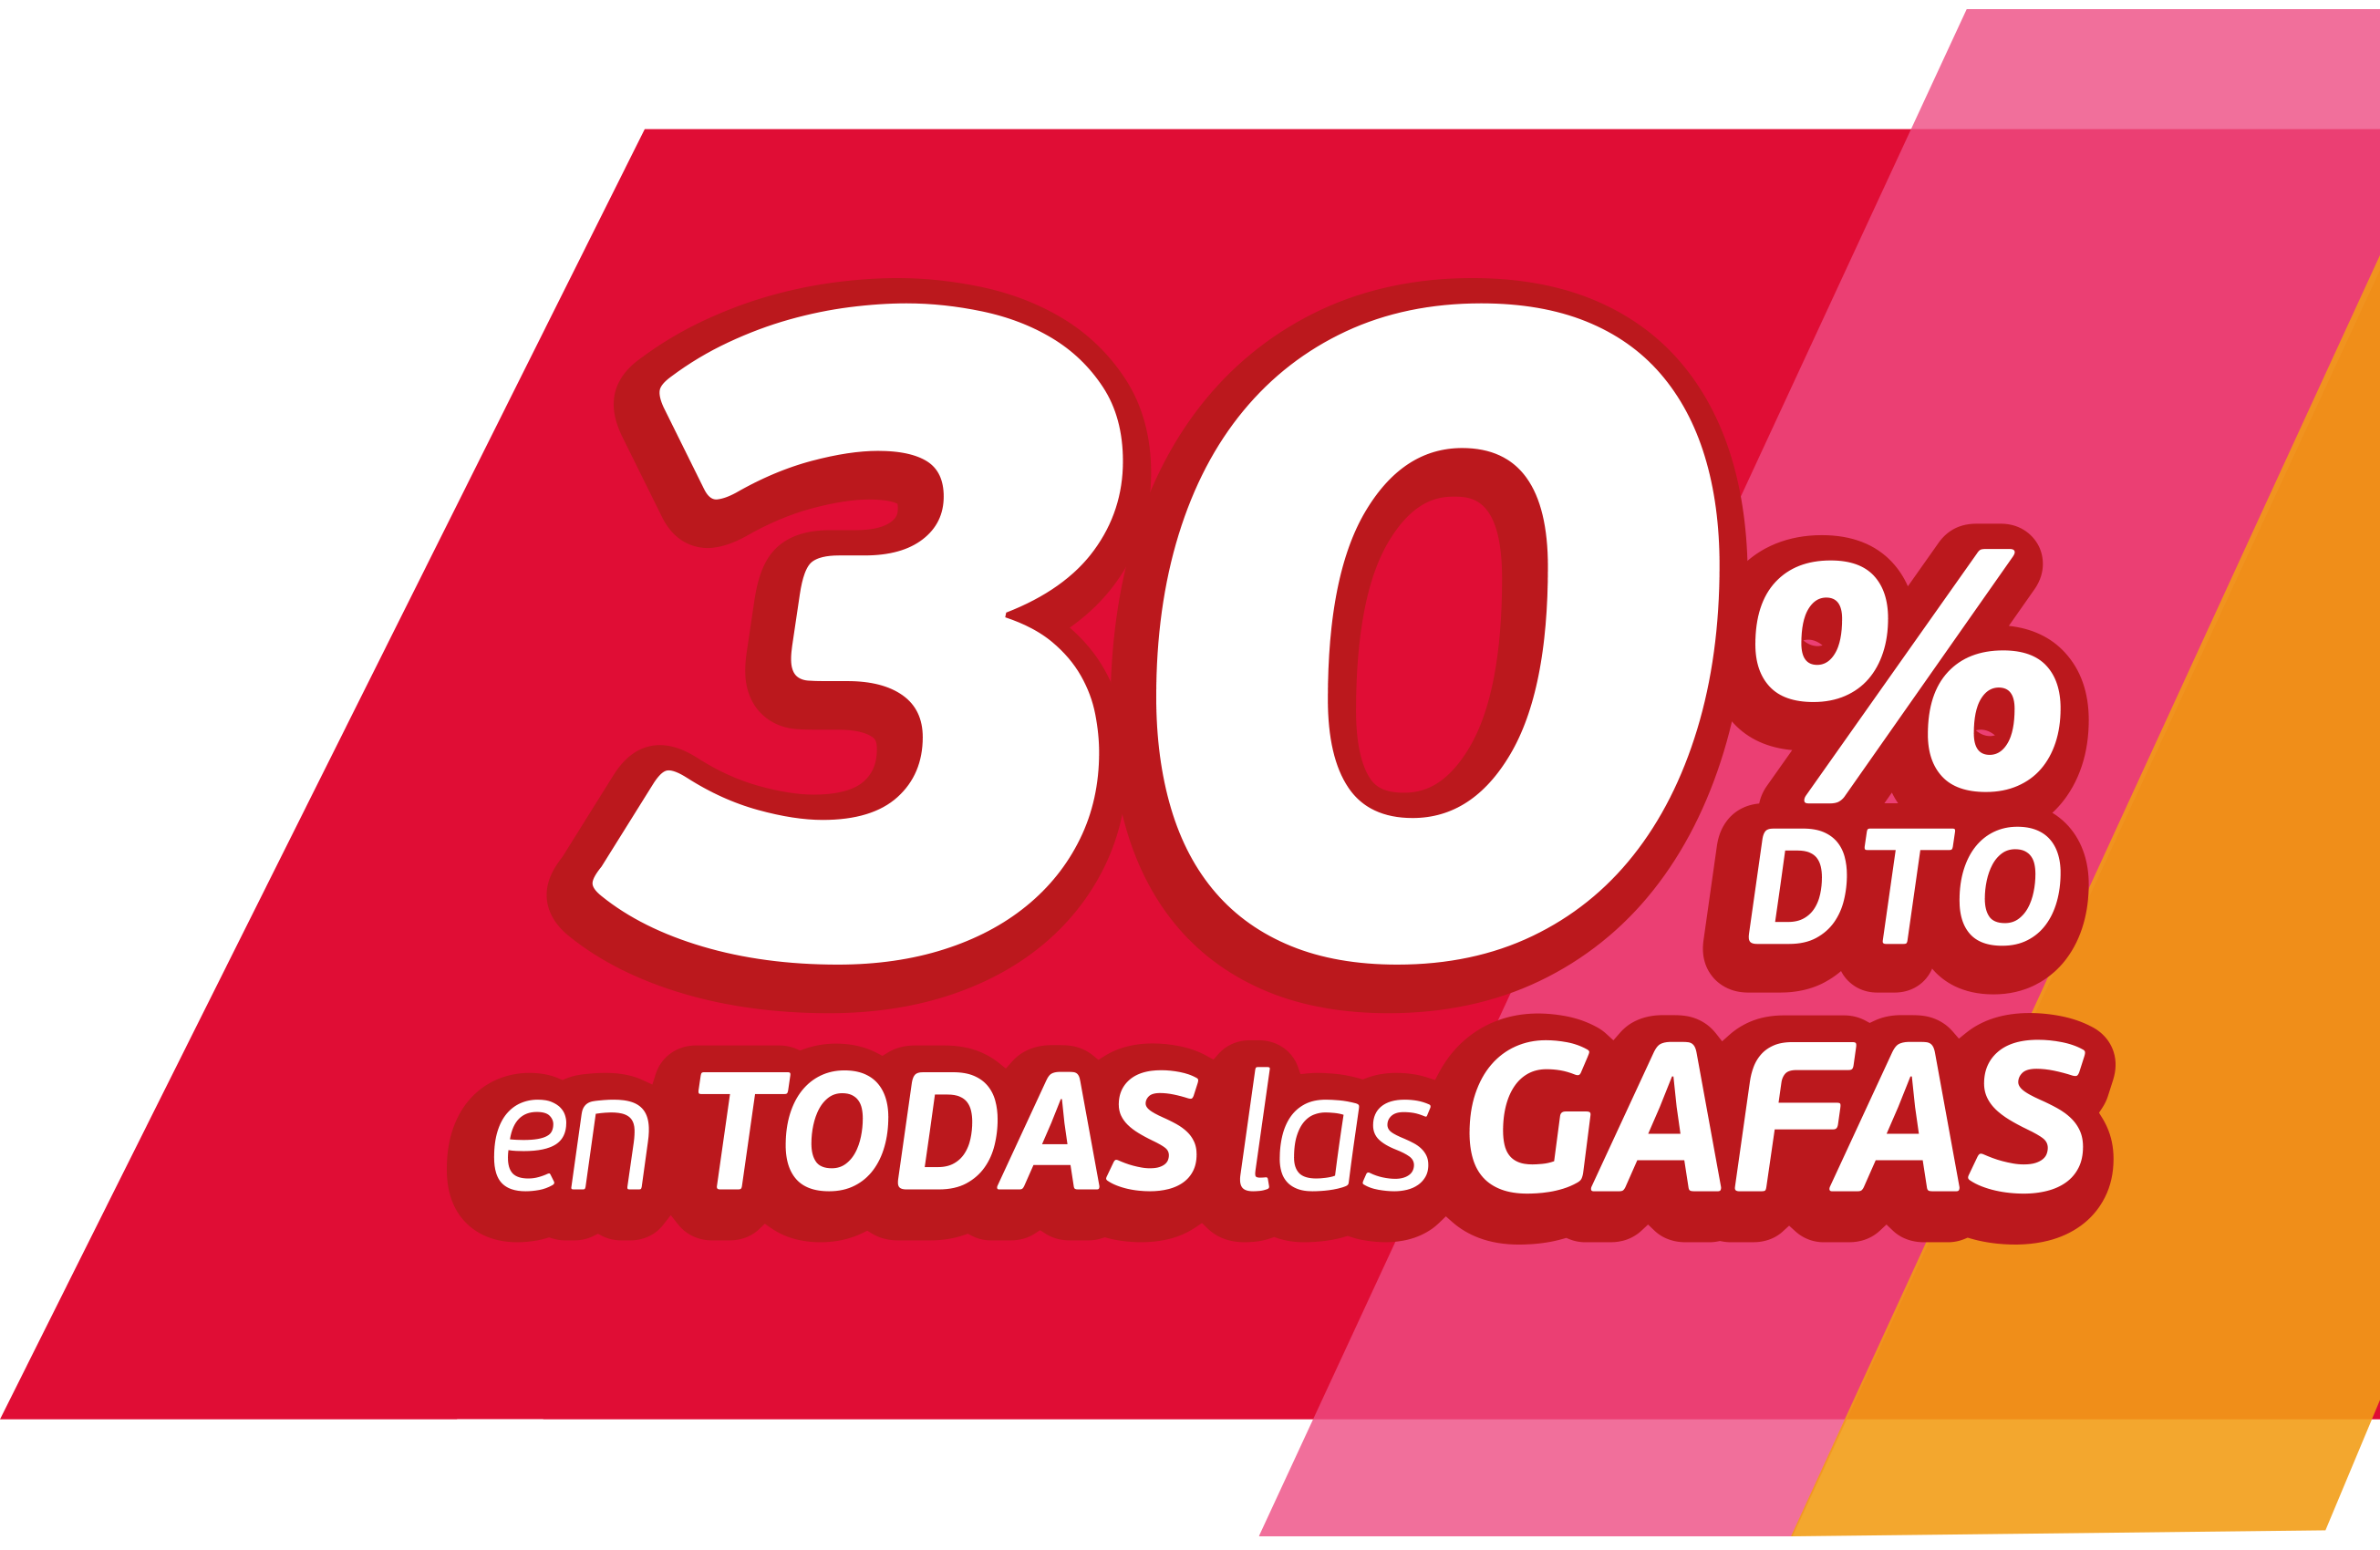 30%DTO